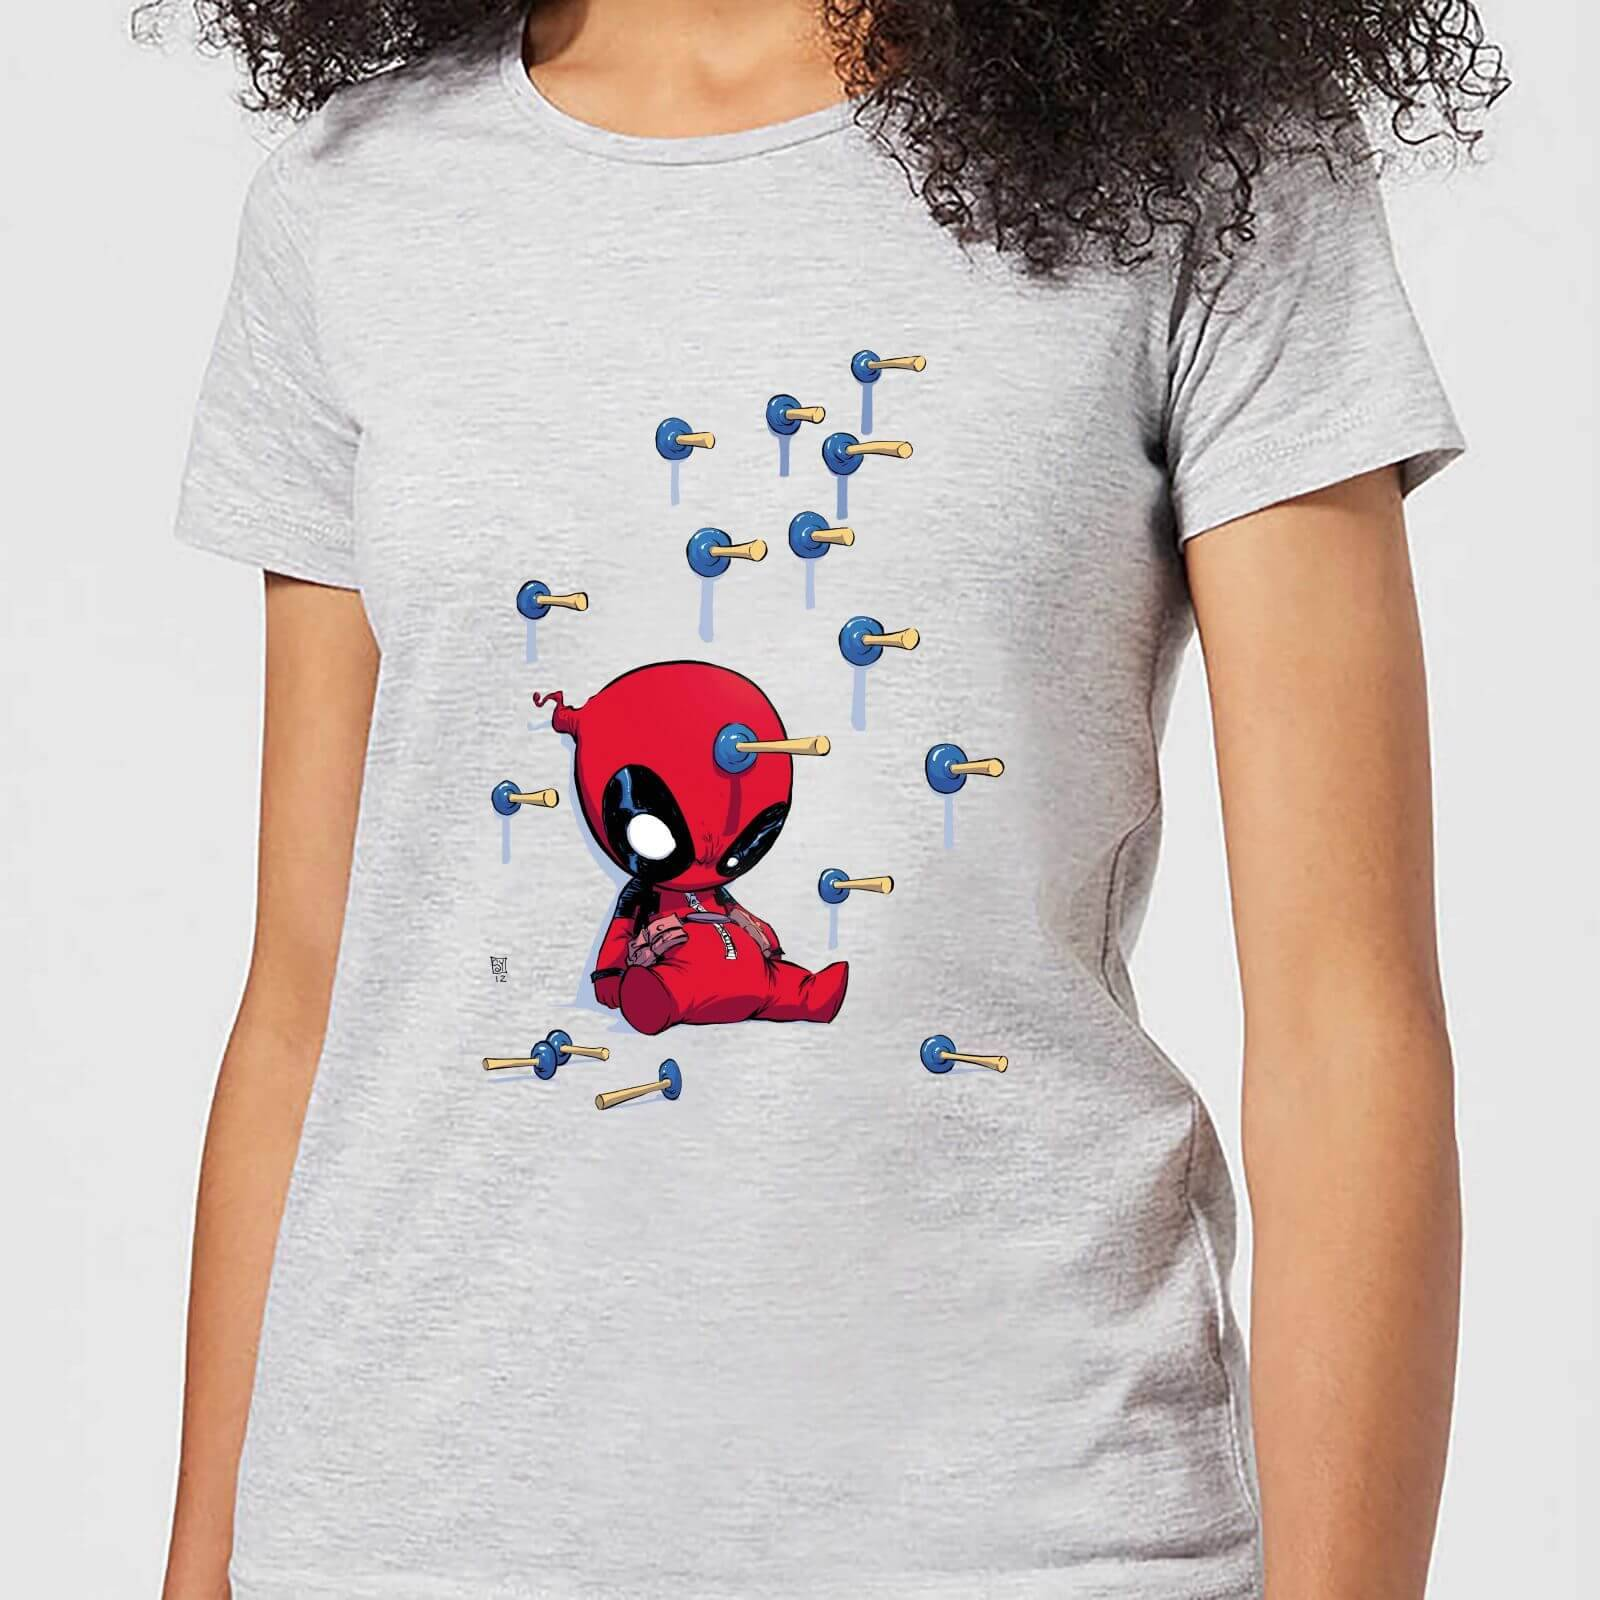 Marvel Deadpool Cartoon Knockout Women's T-Shirt - Grey - L - Grey